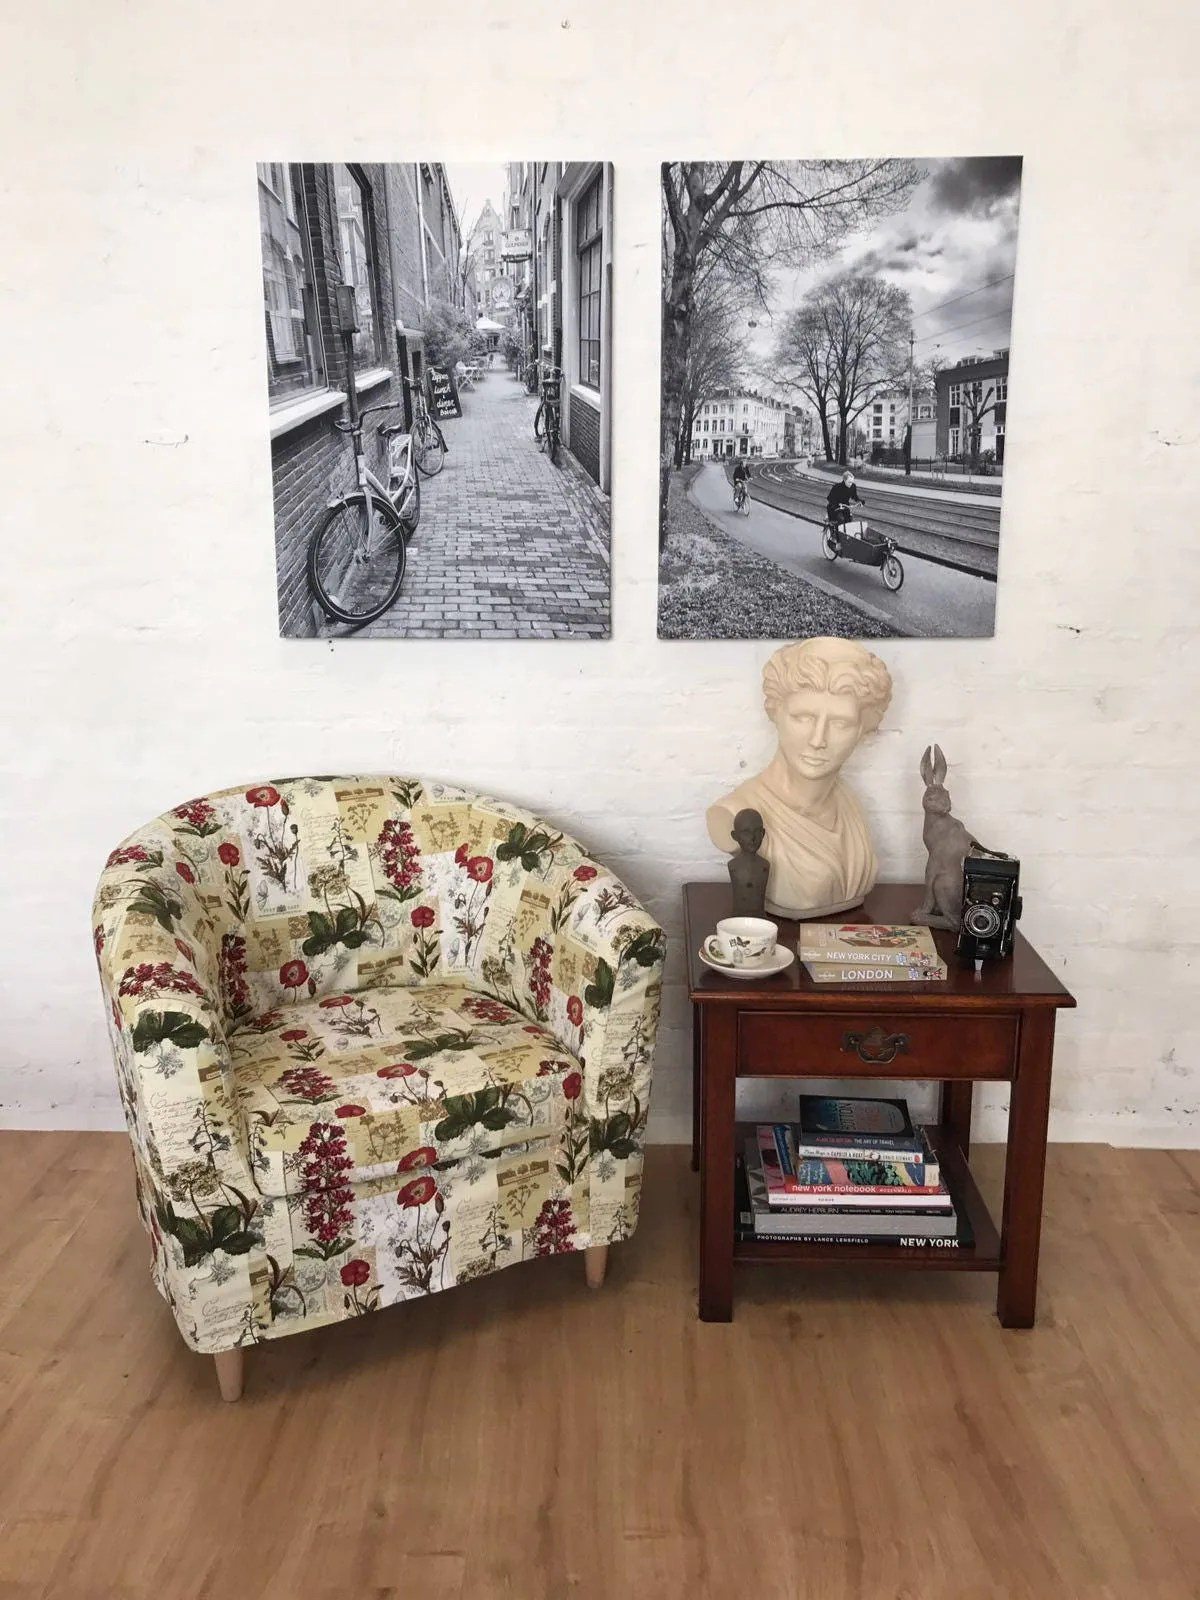 garden tub chair covers tiffany blue slip cover for ikea ektorp tullsta prestigious